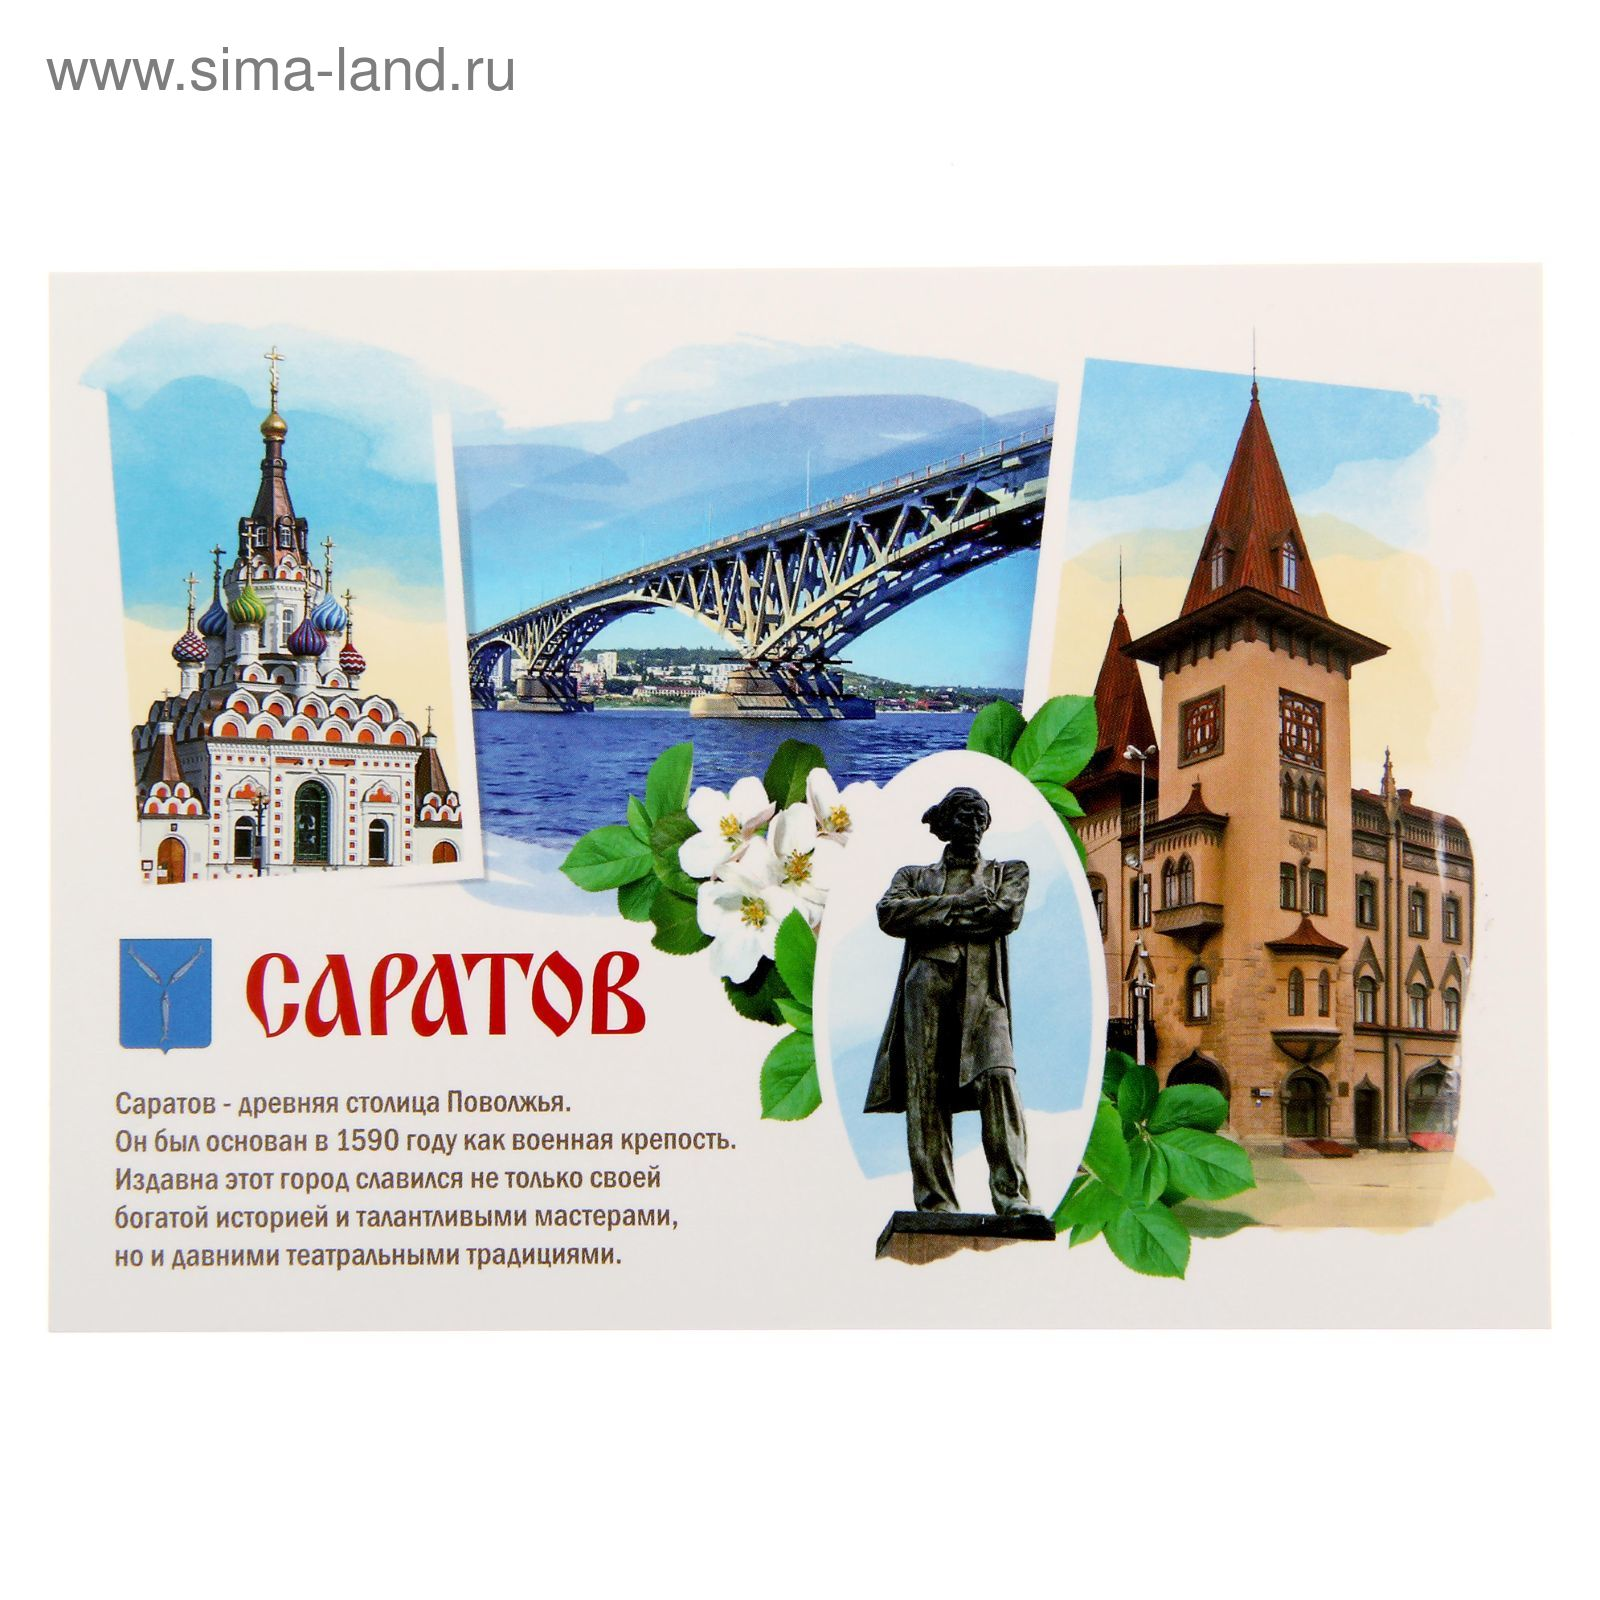 Заказ открыток саратов